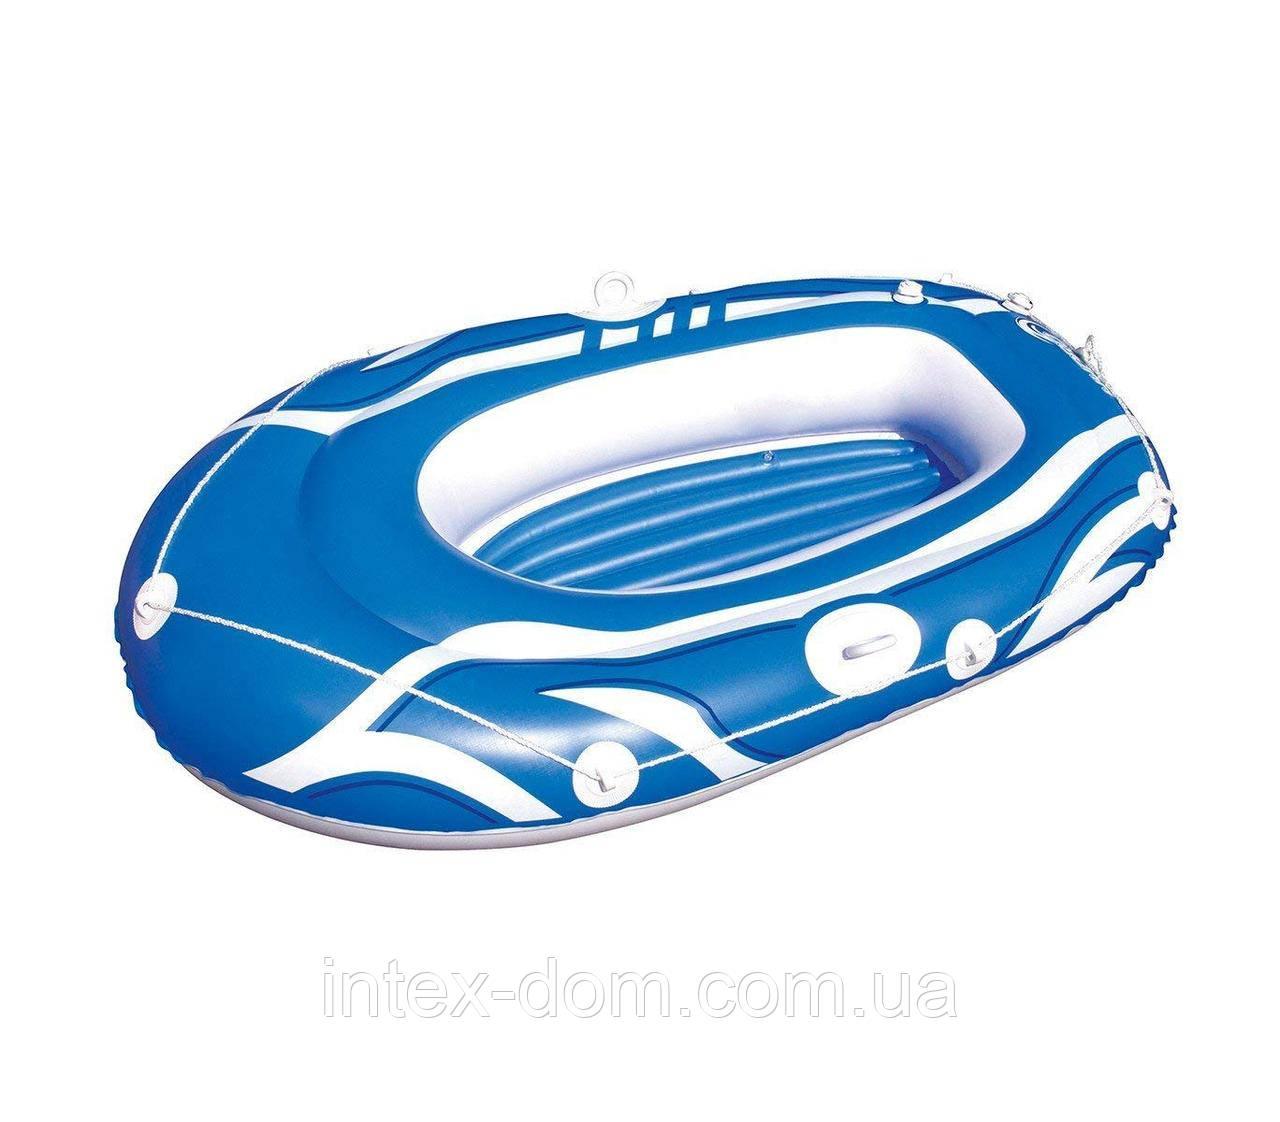 Детская надувная лодка BESTWAY (61050)